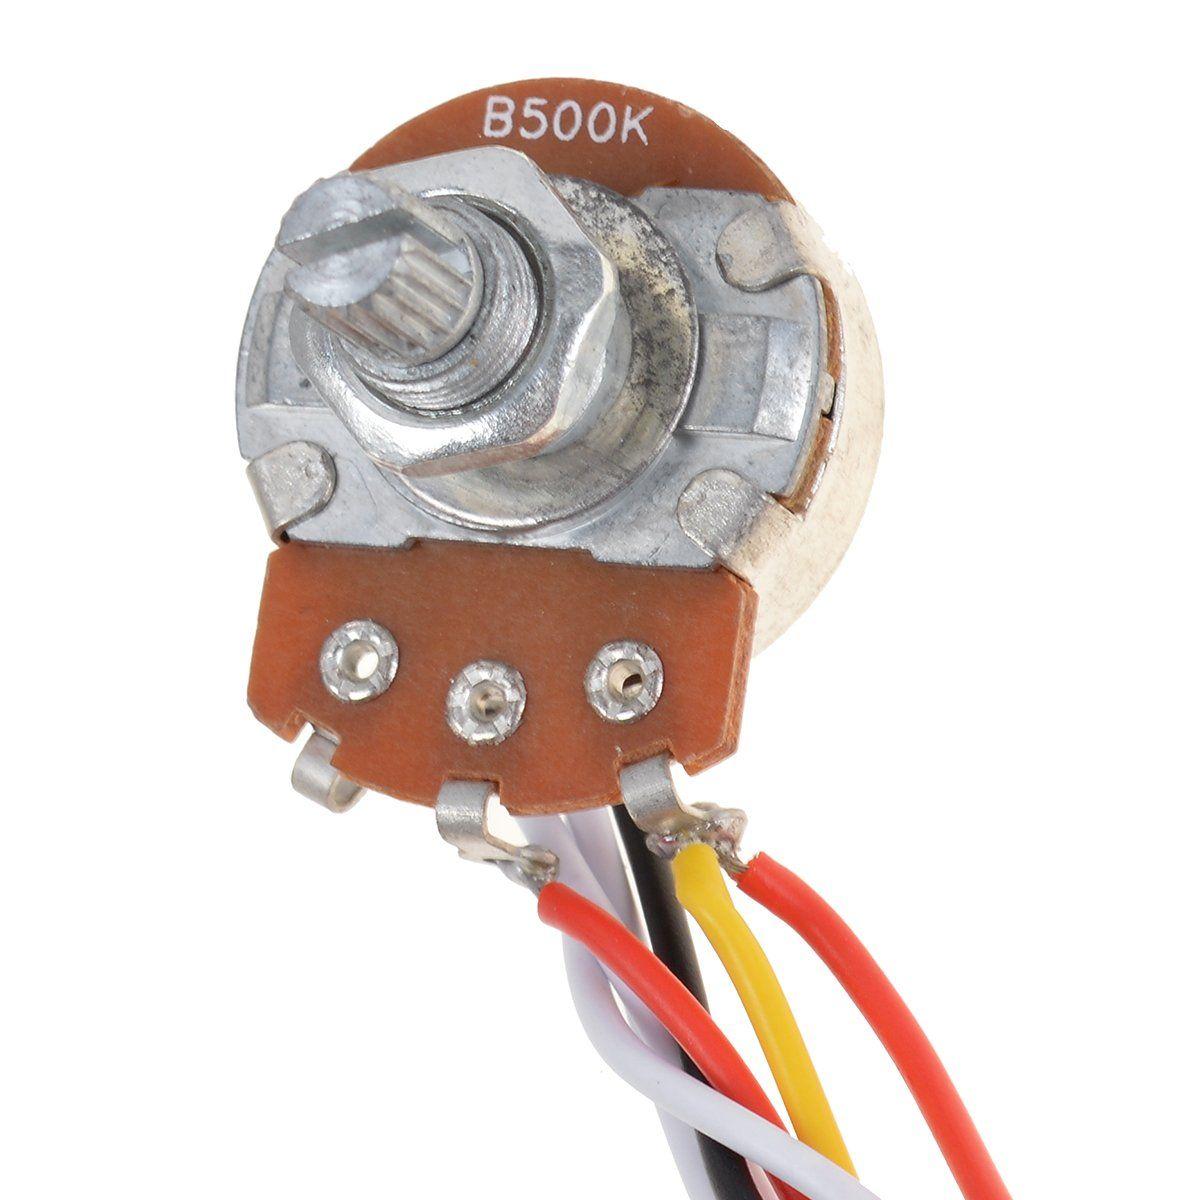 Kmise Mi0316 3 Pickup Guitar Wiring Harness Prewired With 500k Pots 5 Way 1 Volume